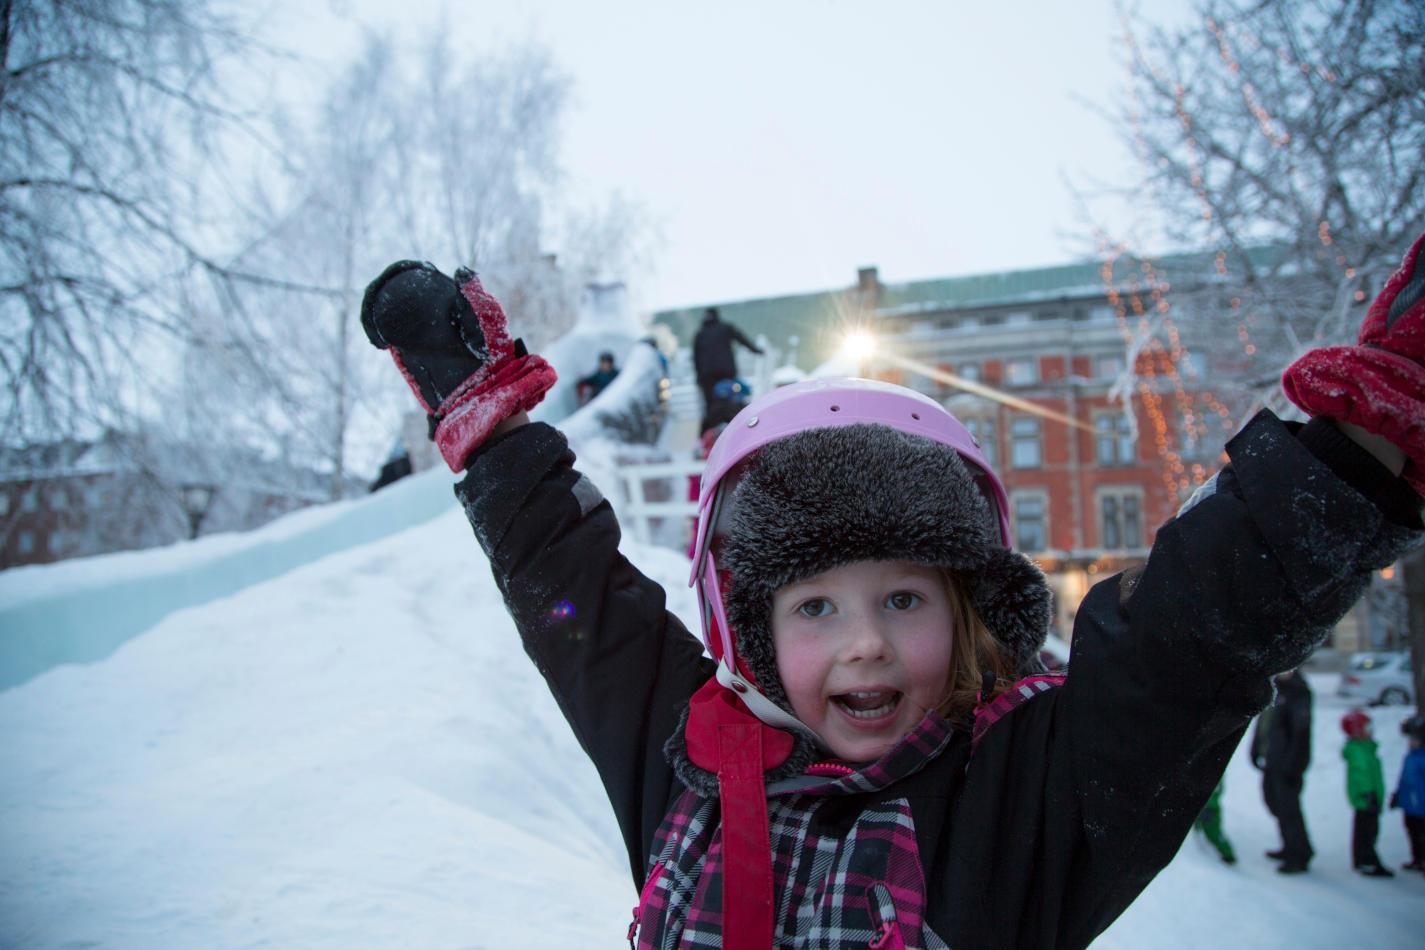 Luleå: magically magnificent winter splendour - Scan Magazine